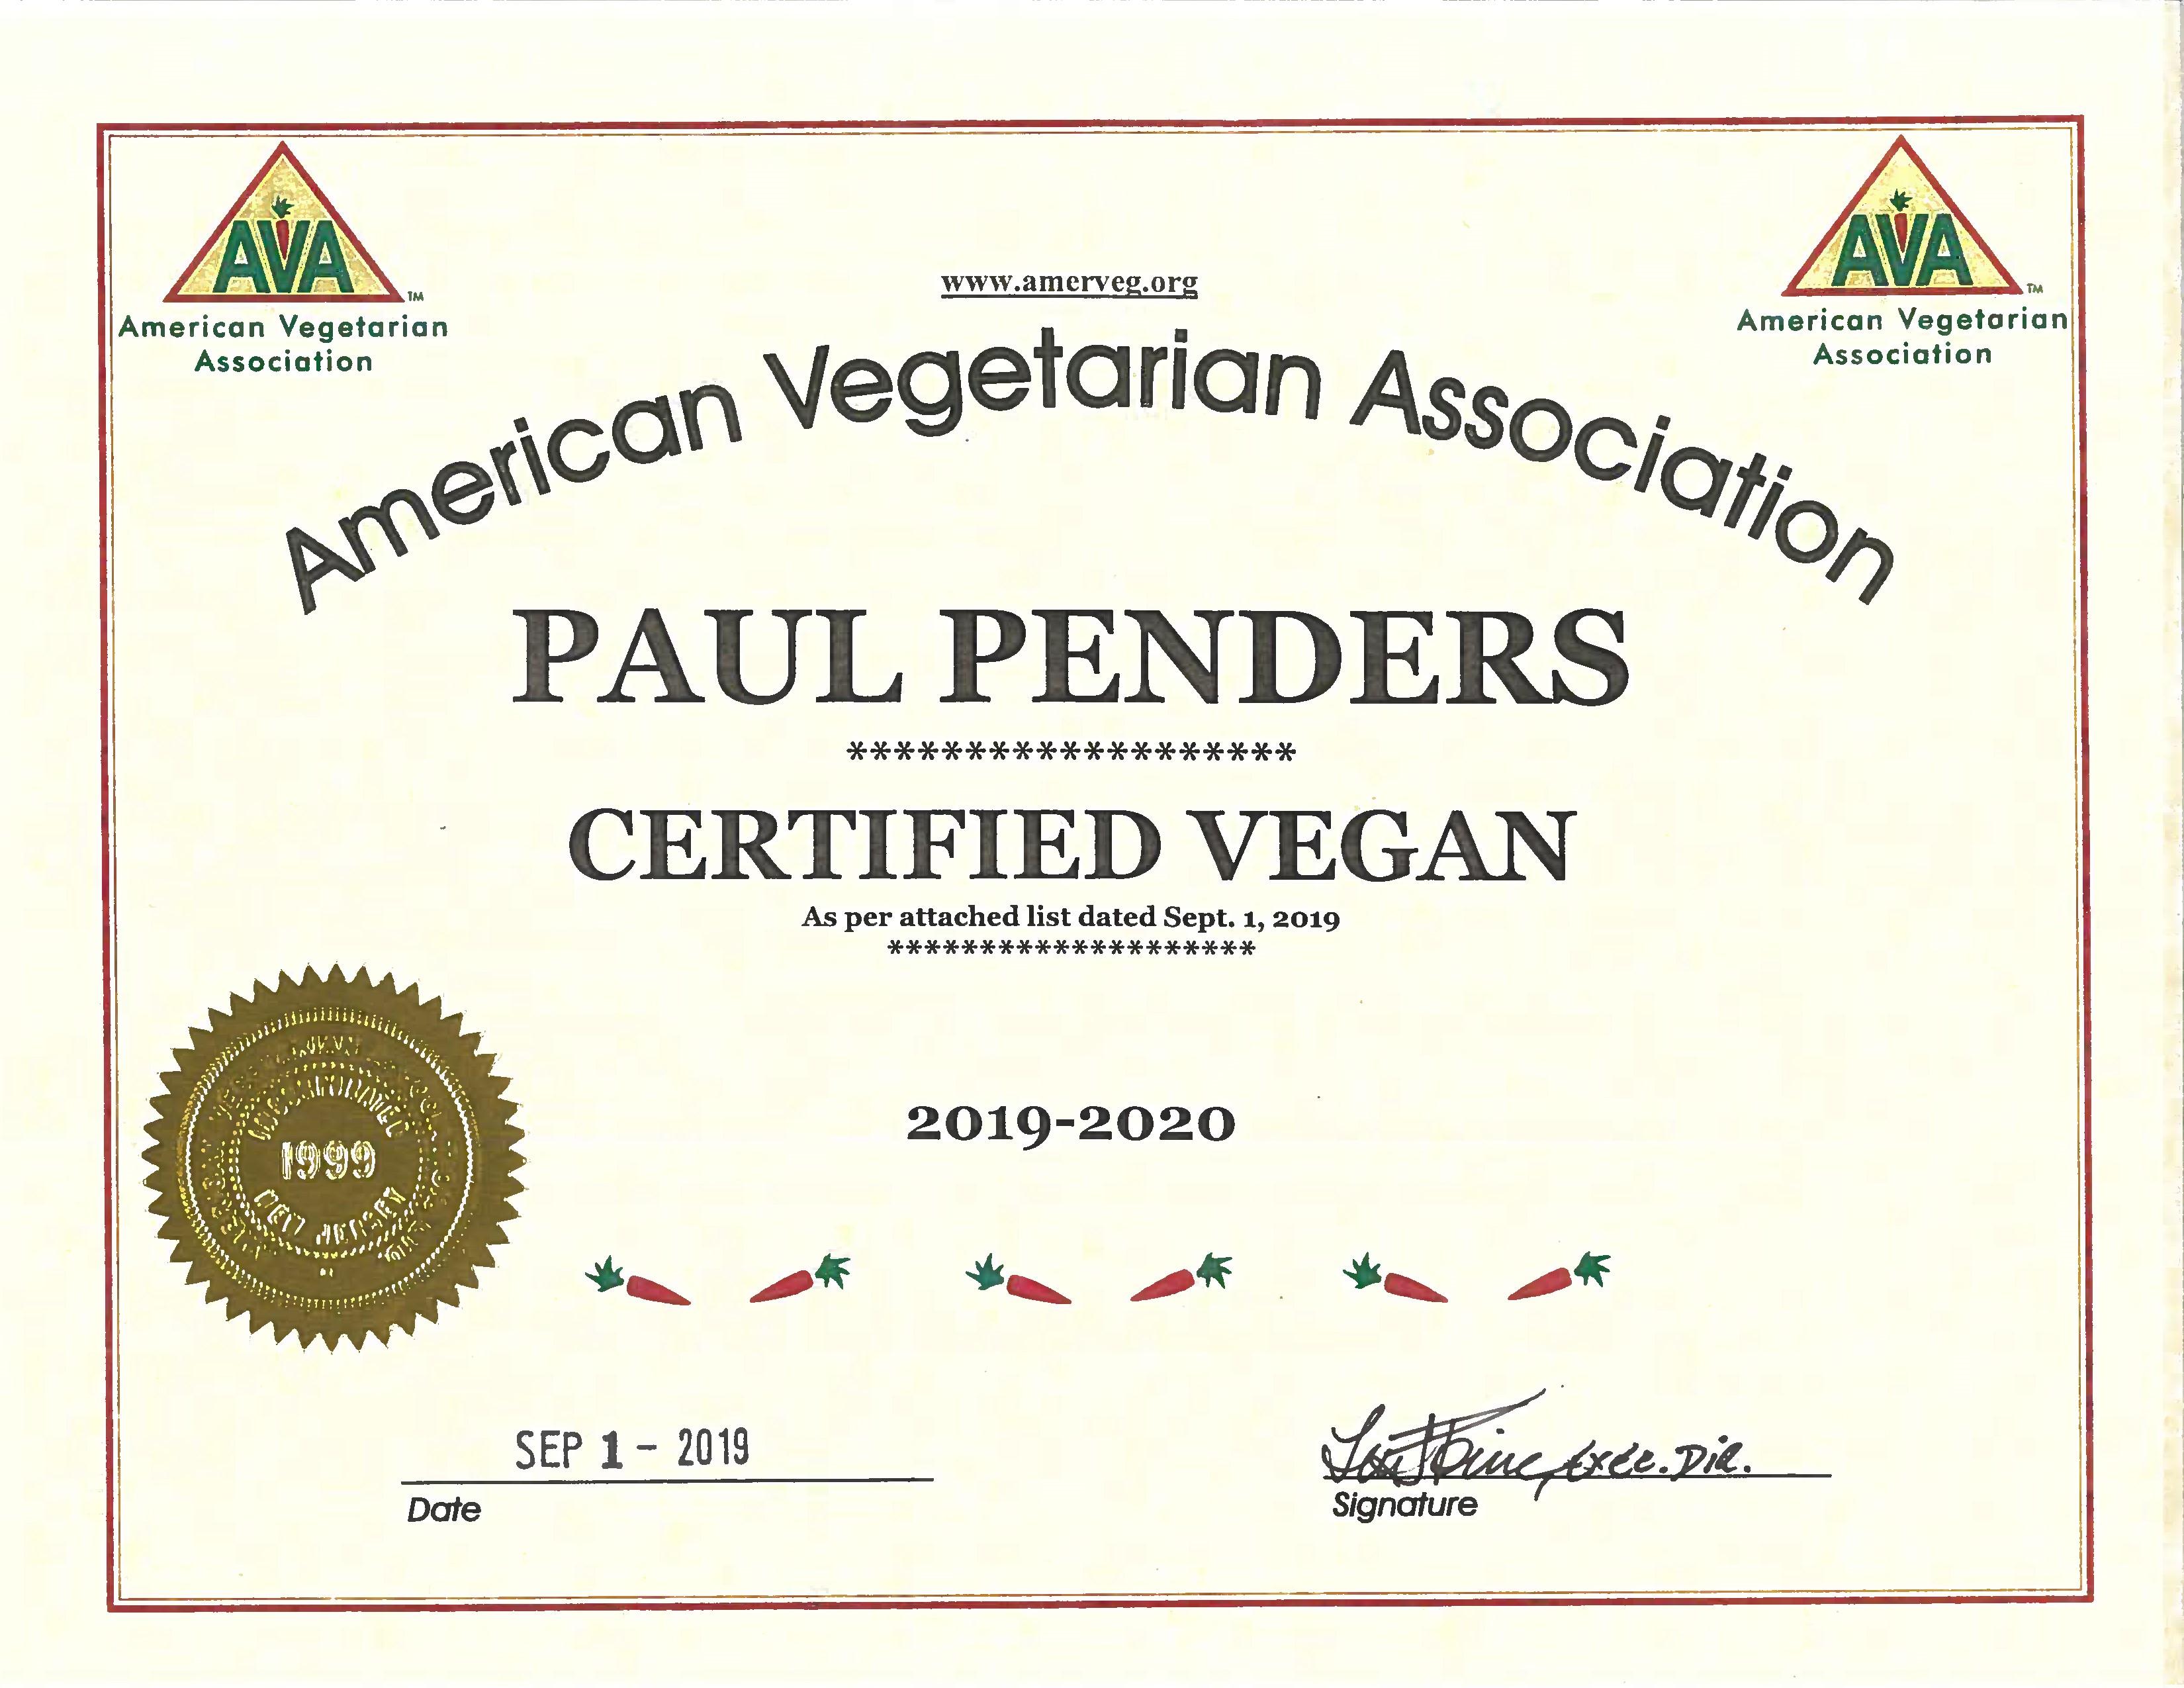 Paul Penders + sun care + Herbal Sun Prosperity + 100 gm + online